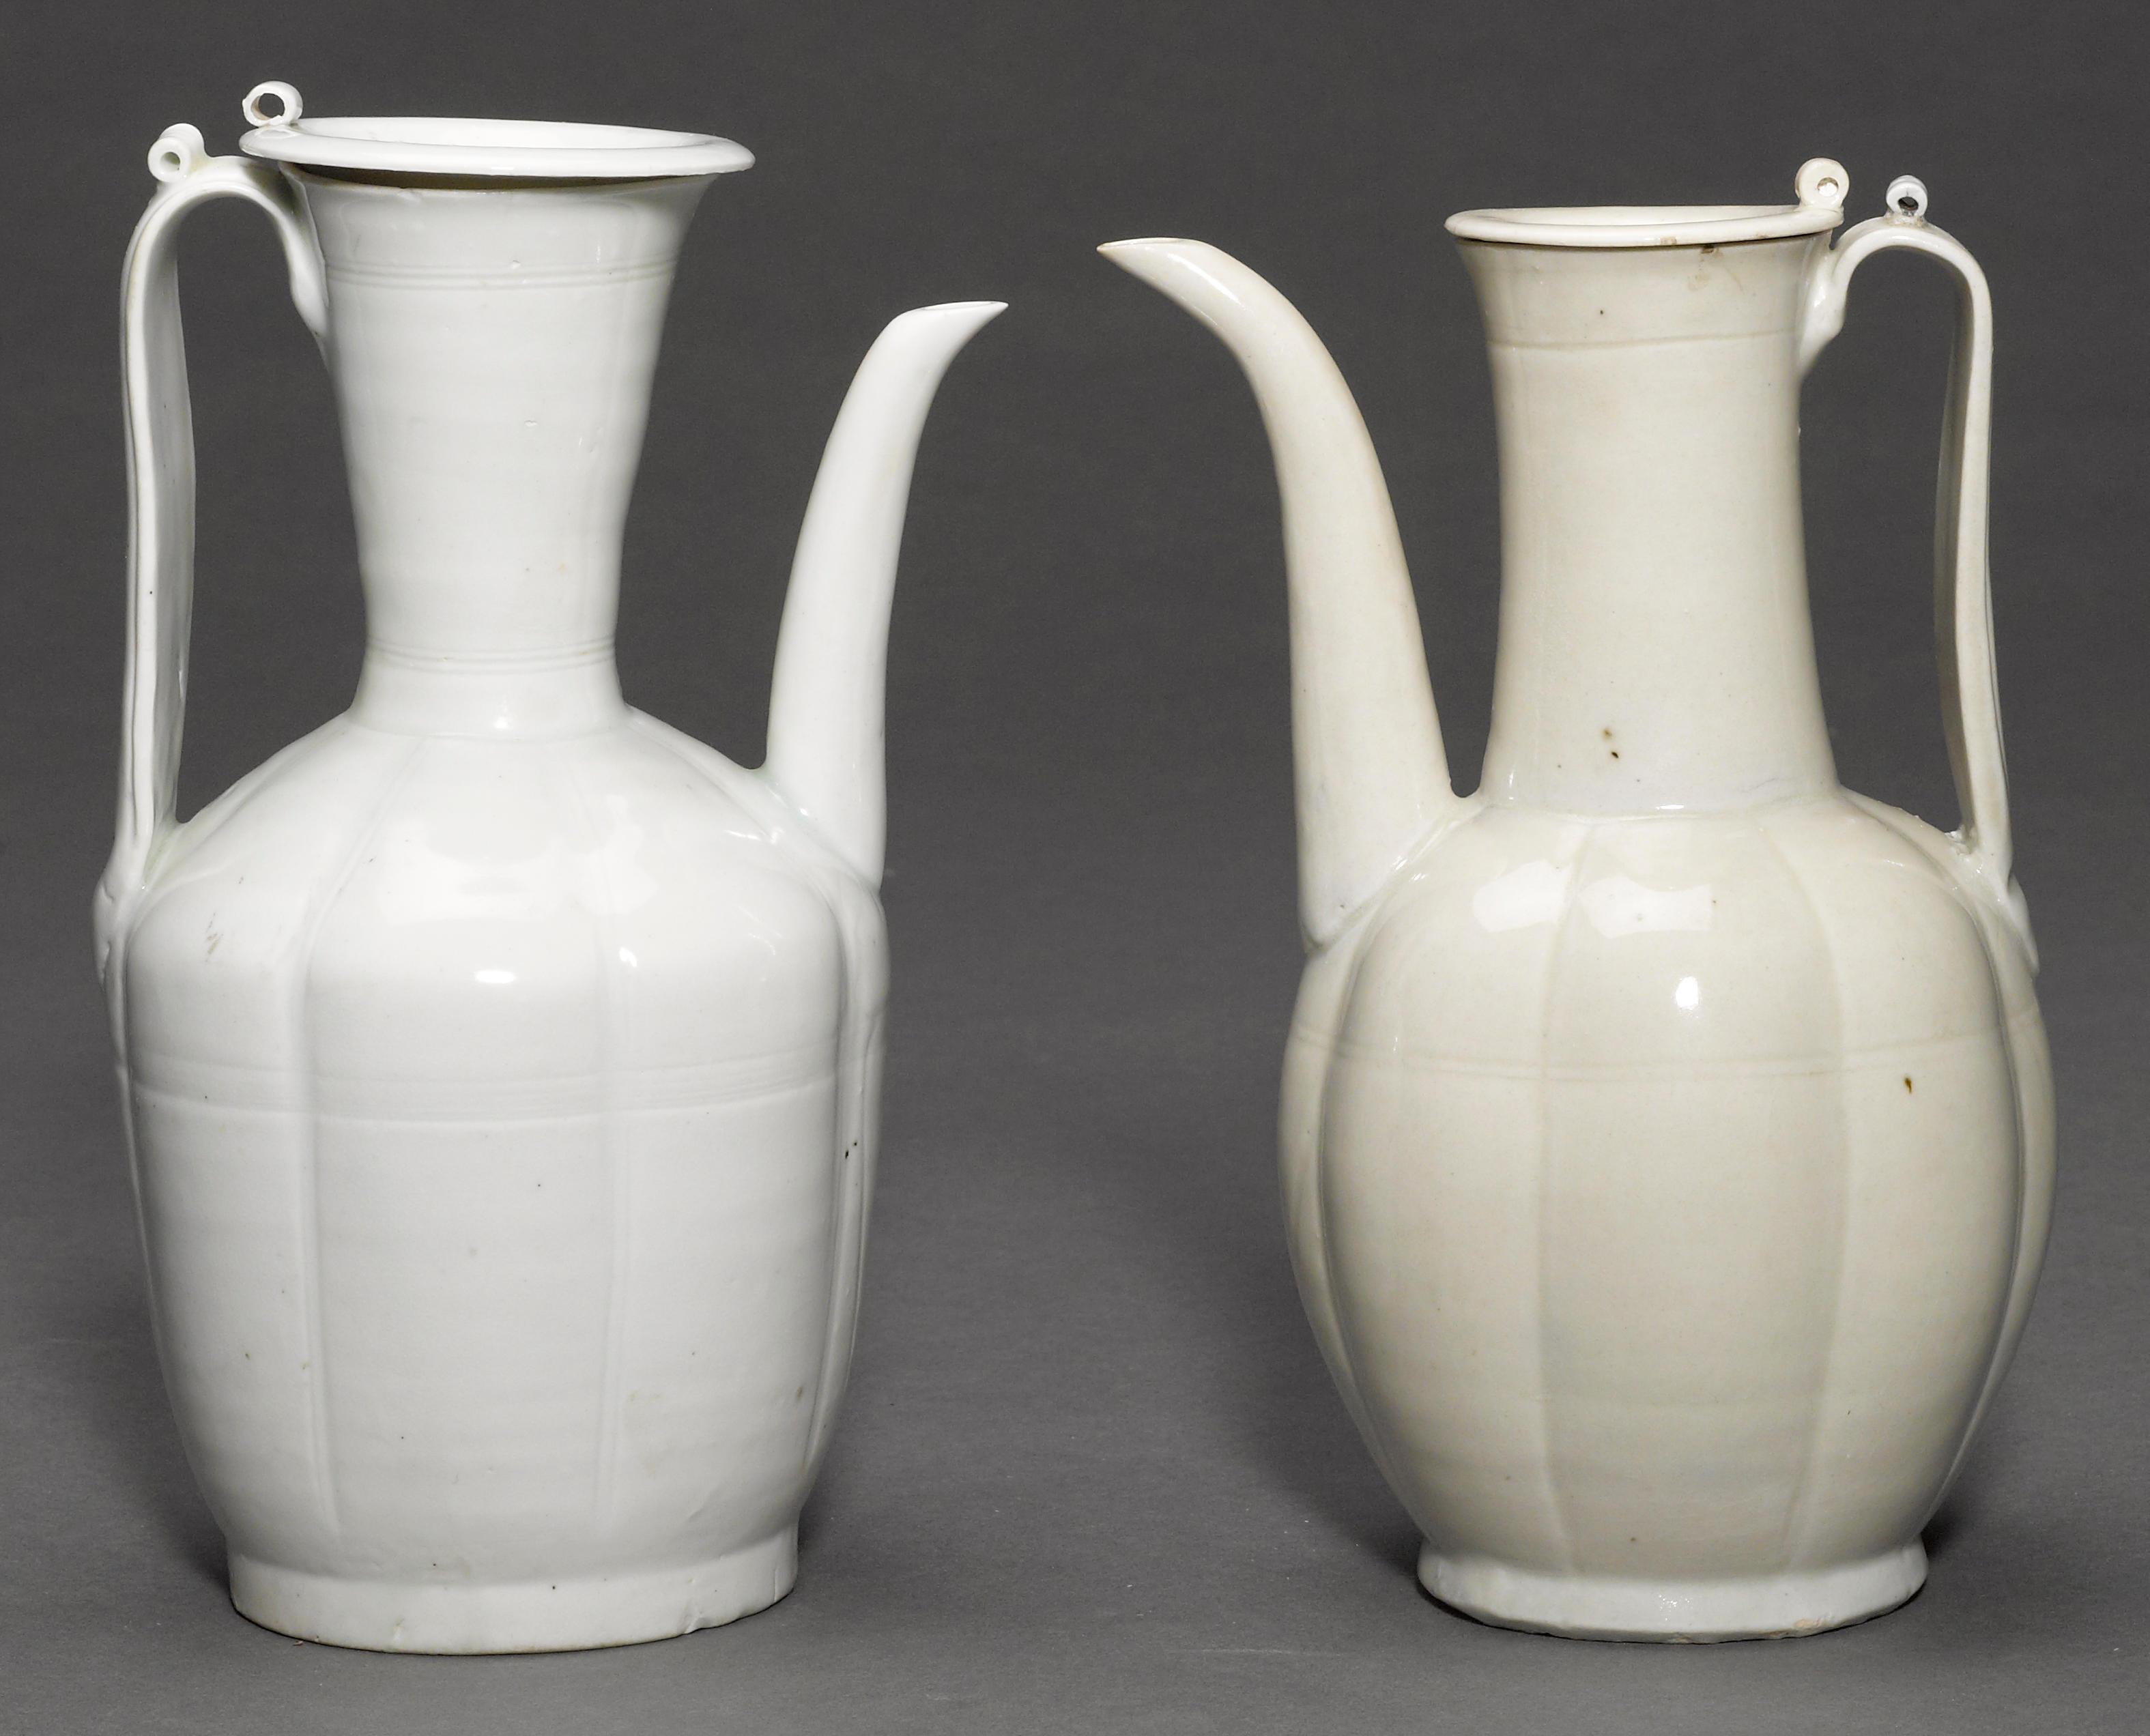 Two qingbai glazed porcelain covered ewers